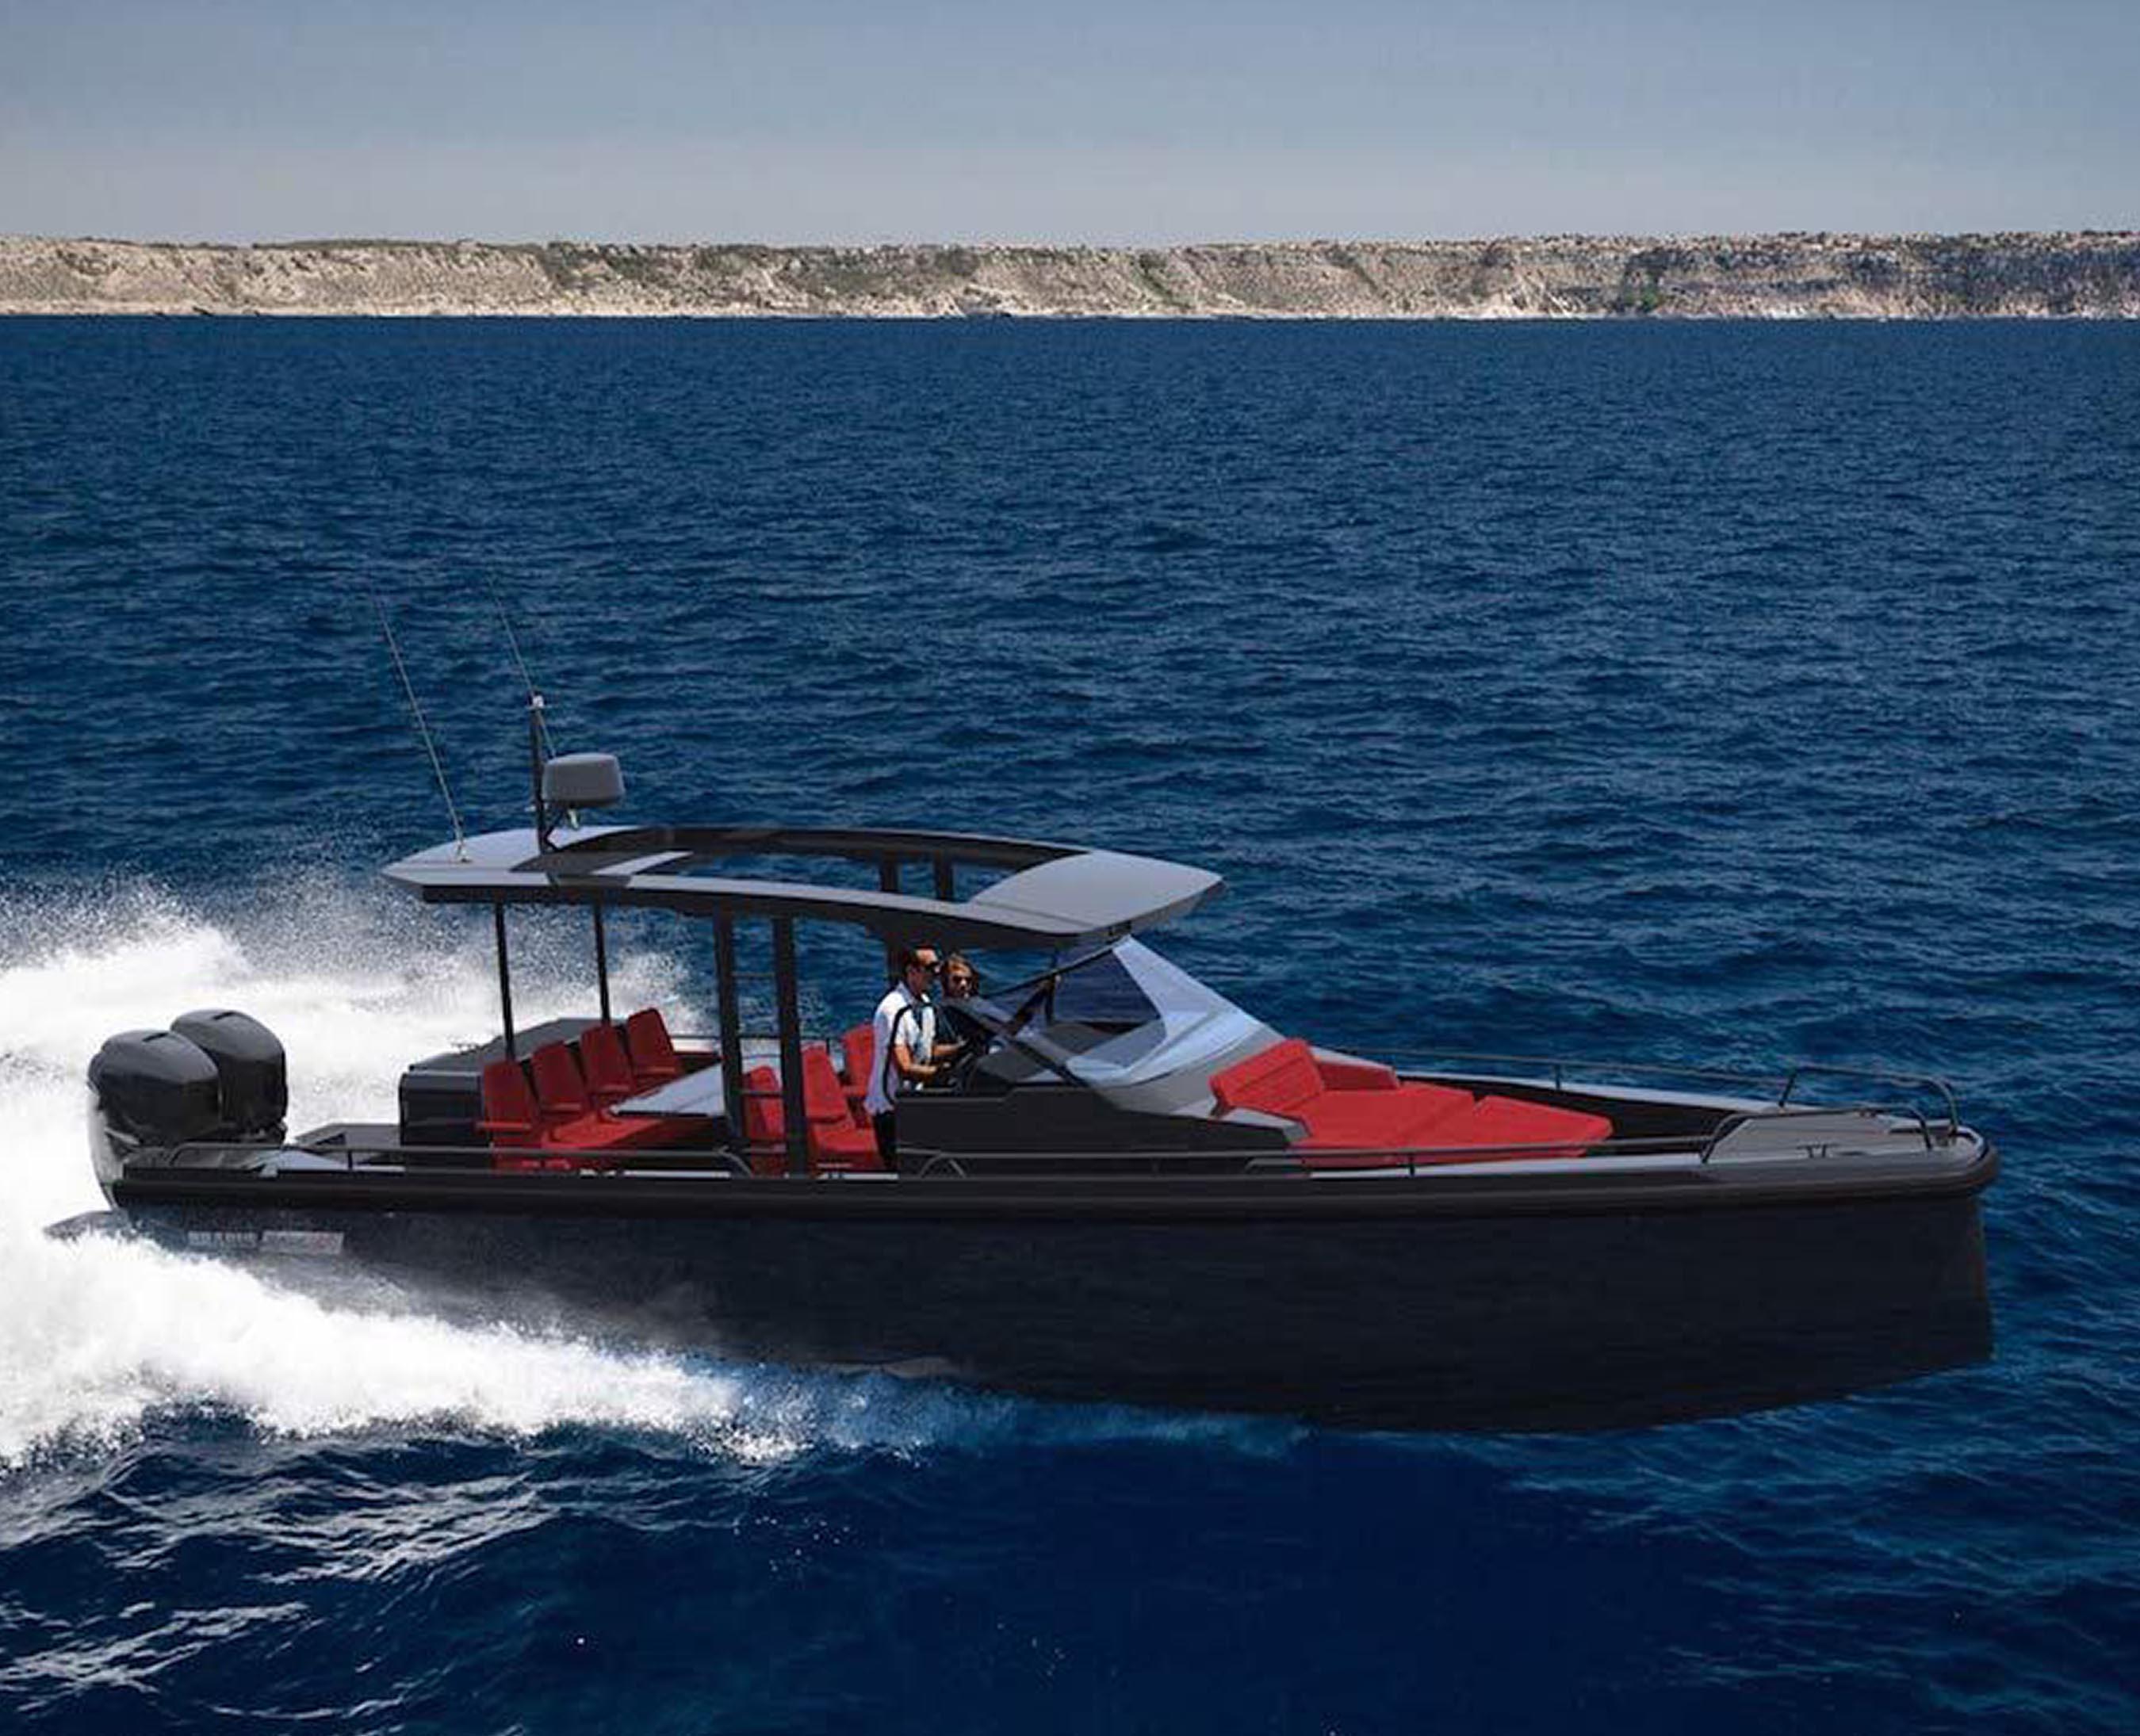 Nautical Ventures Group announces U.S. debut of Brabus Shadow 800 tender